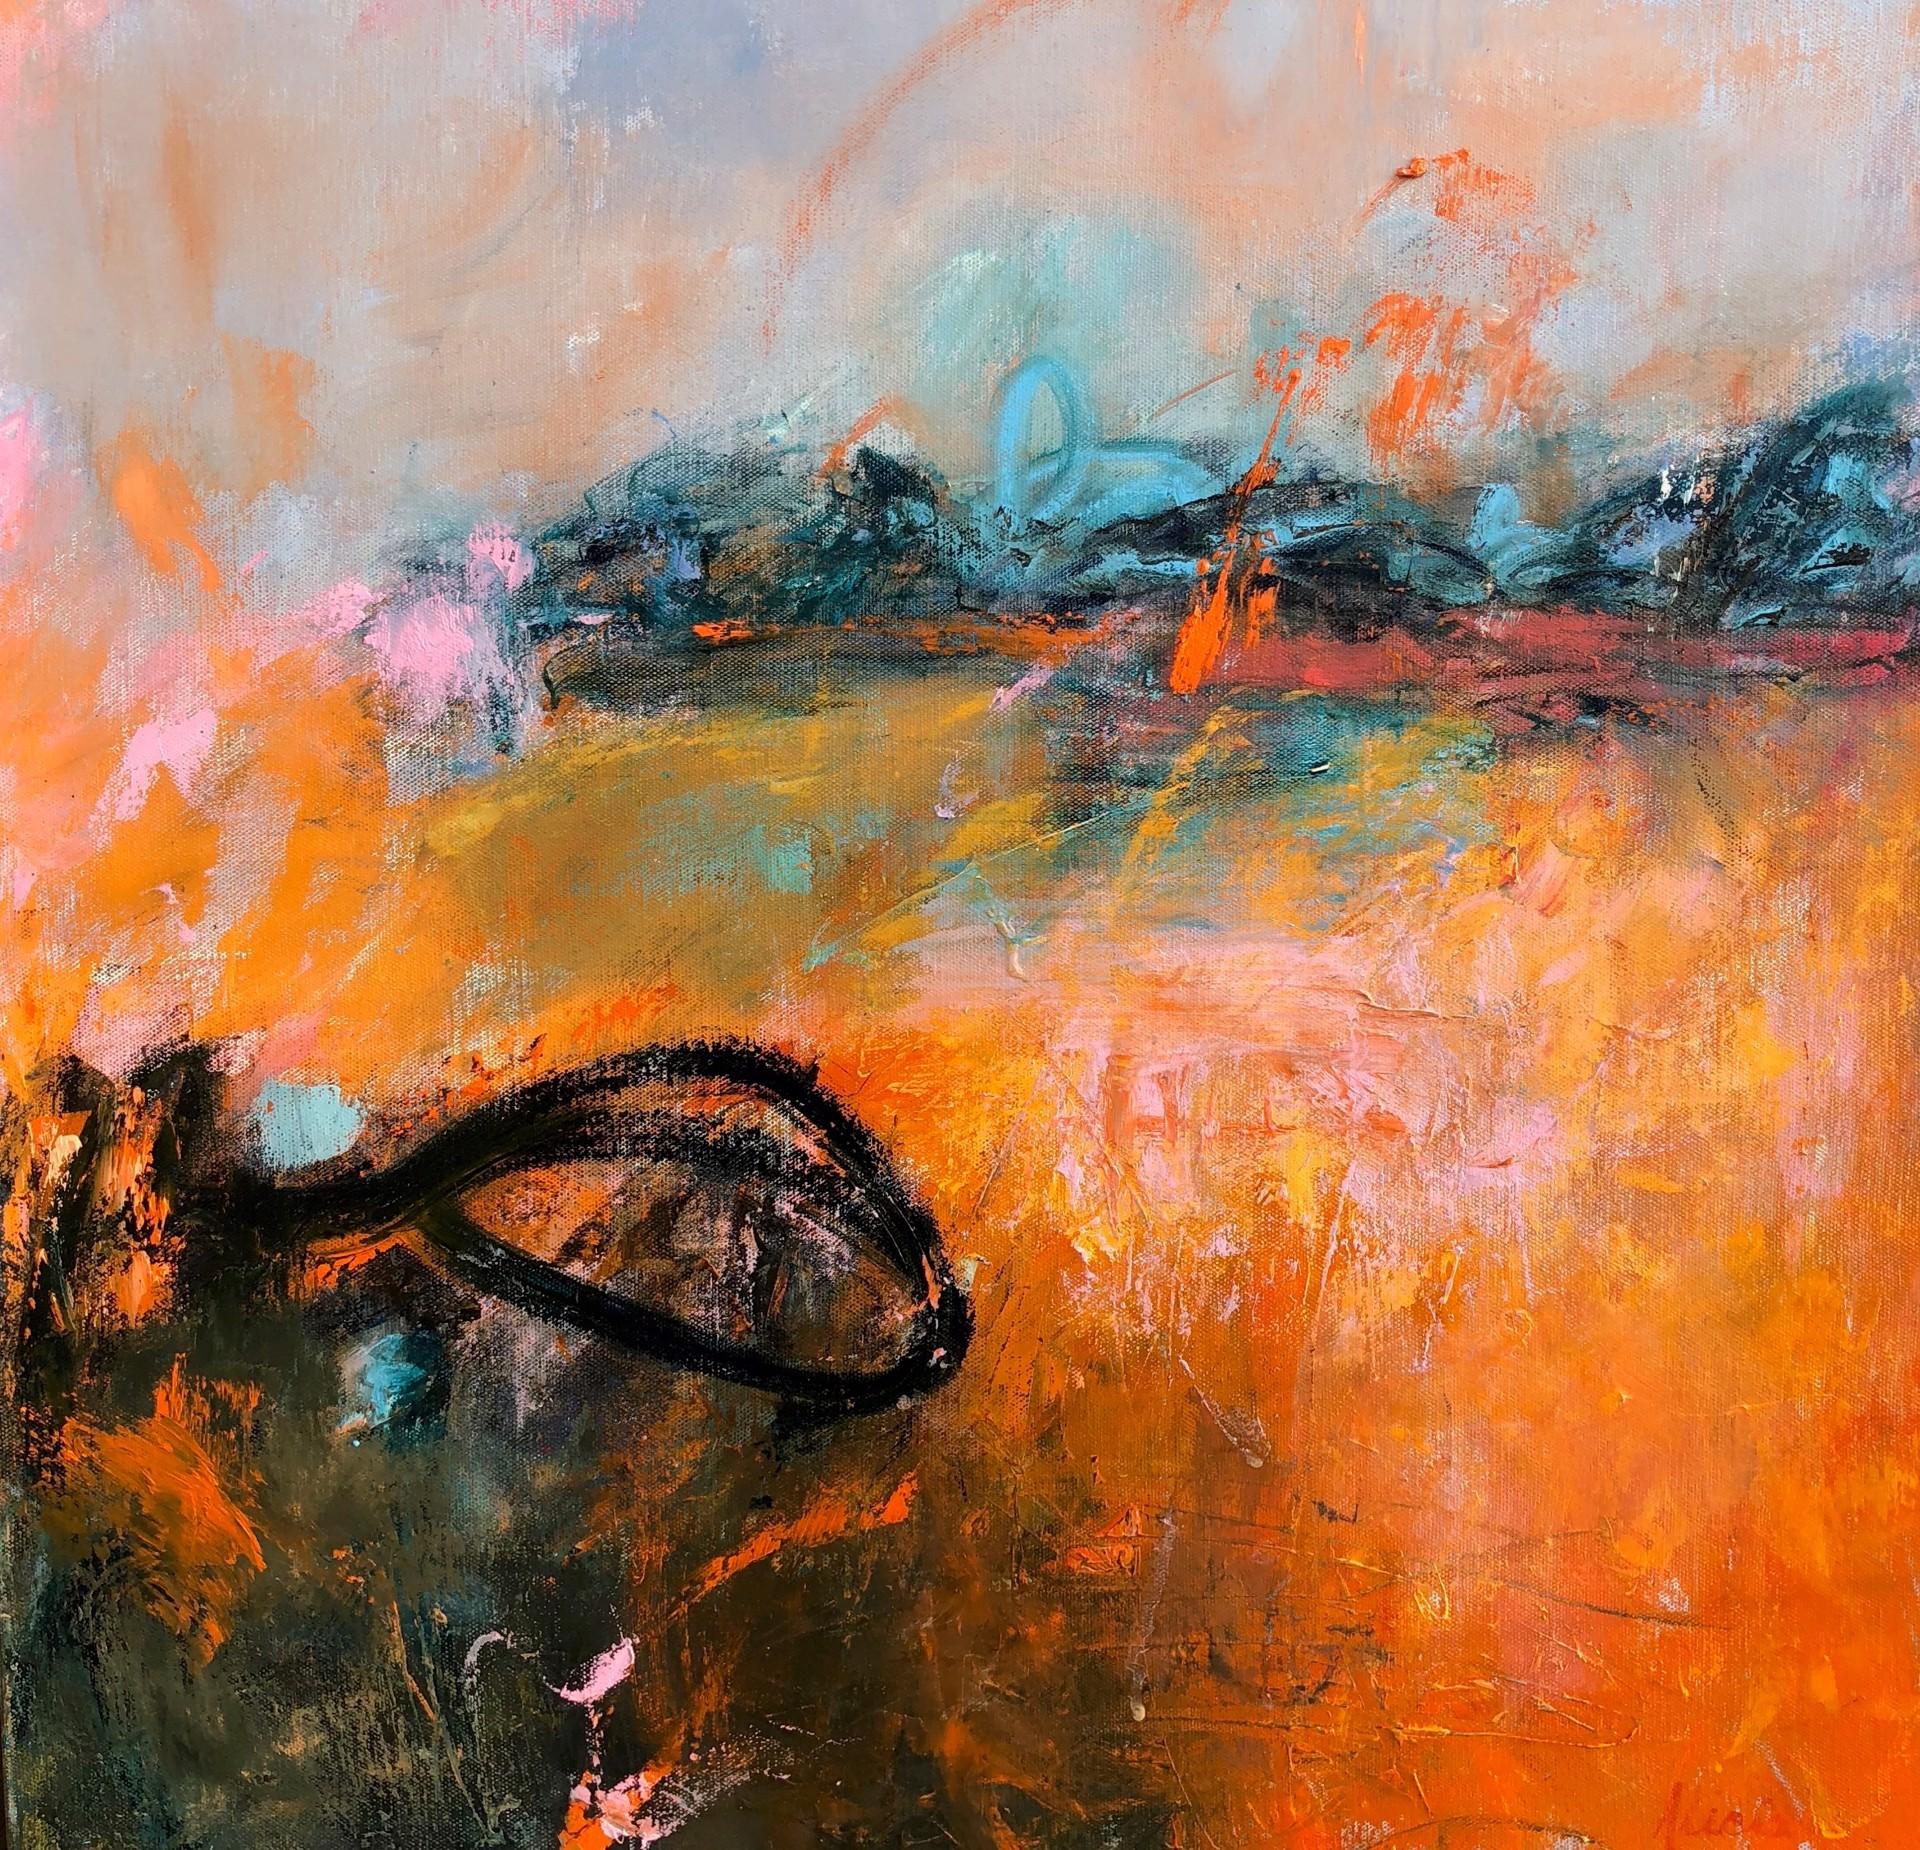 Over the Edge by Alicia Gitlitz